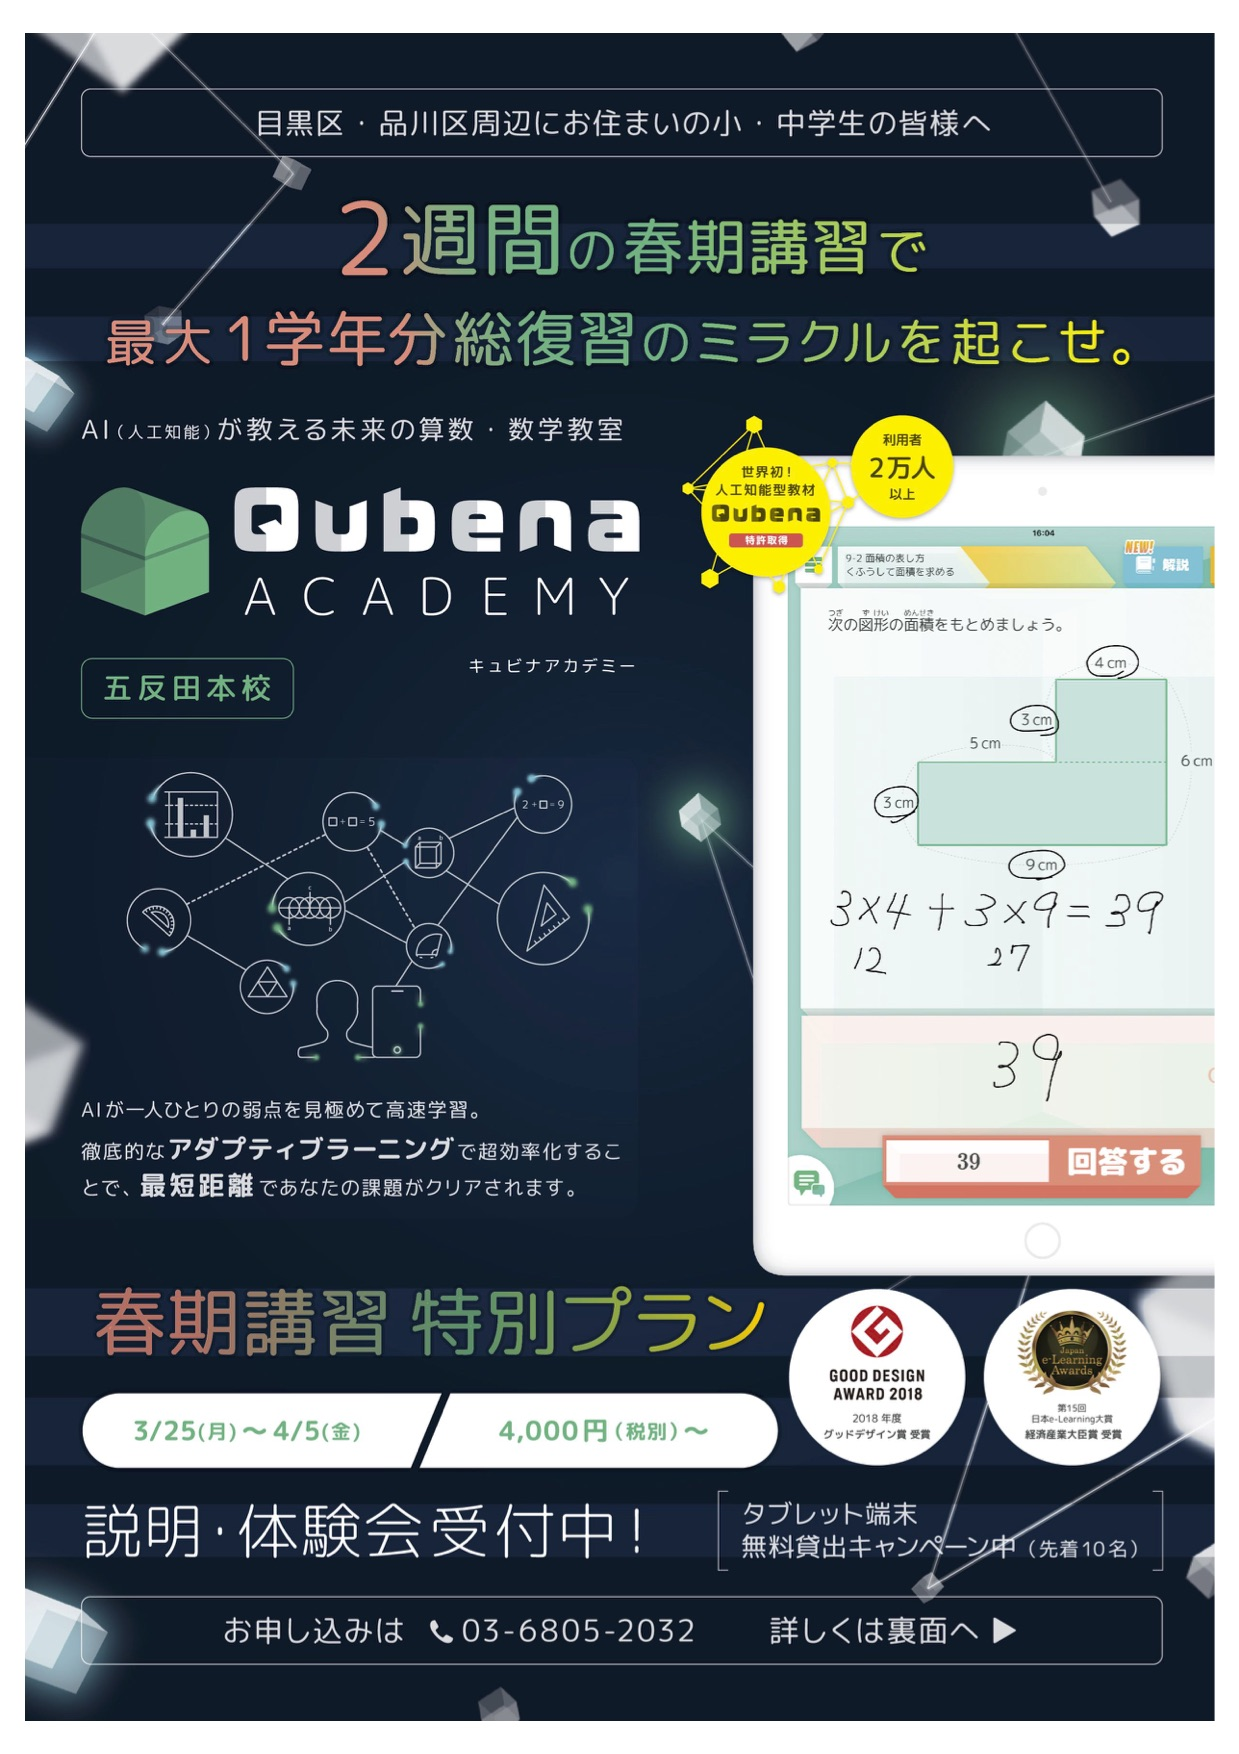 AI型タブレット教材で1学年分を2週間で総復習 2019年Qubenaアカデミー春期講習五反田本校ご案内(表紙)